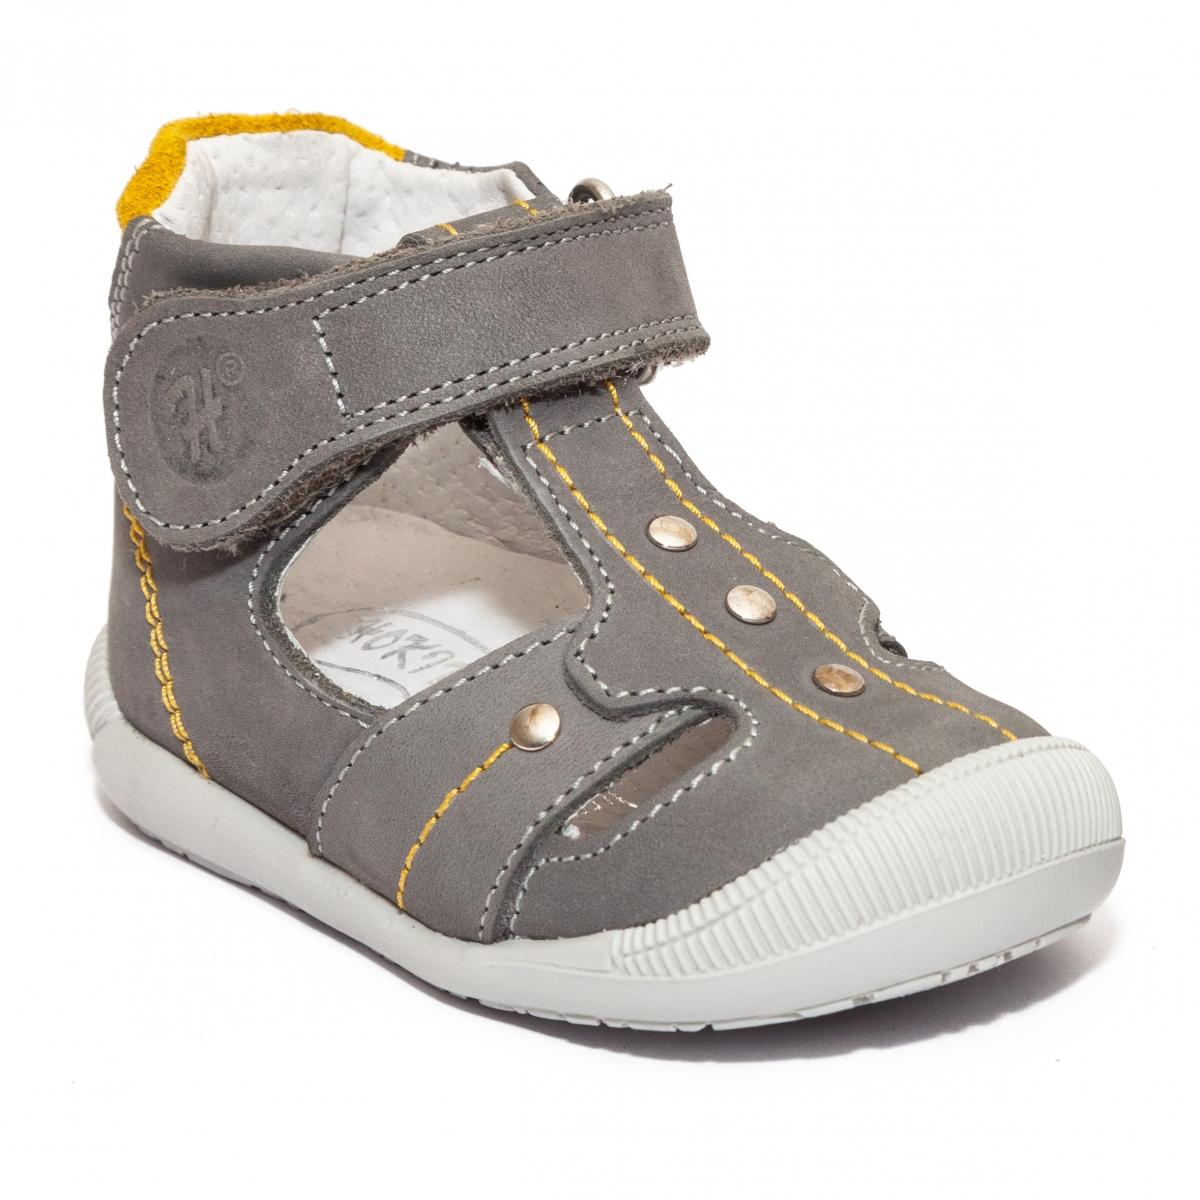 Sandale ortopedice copii hokide 273 gri bufo 18-24